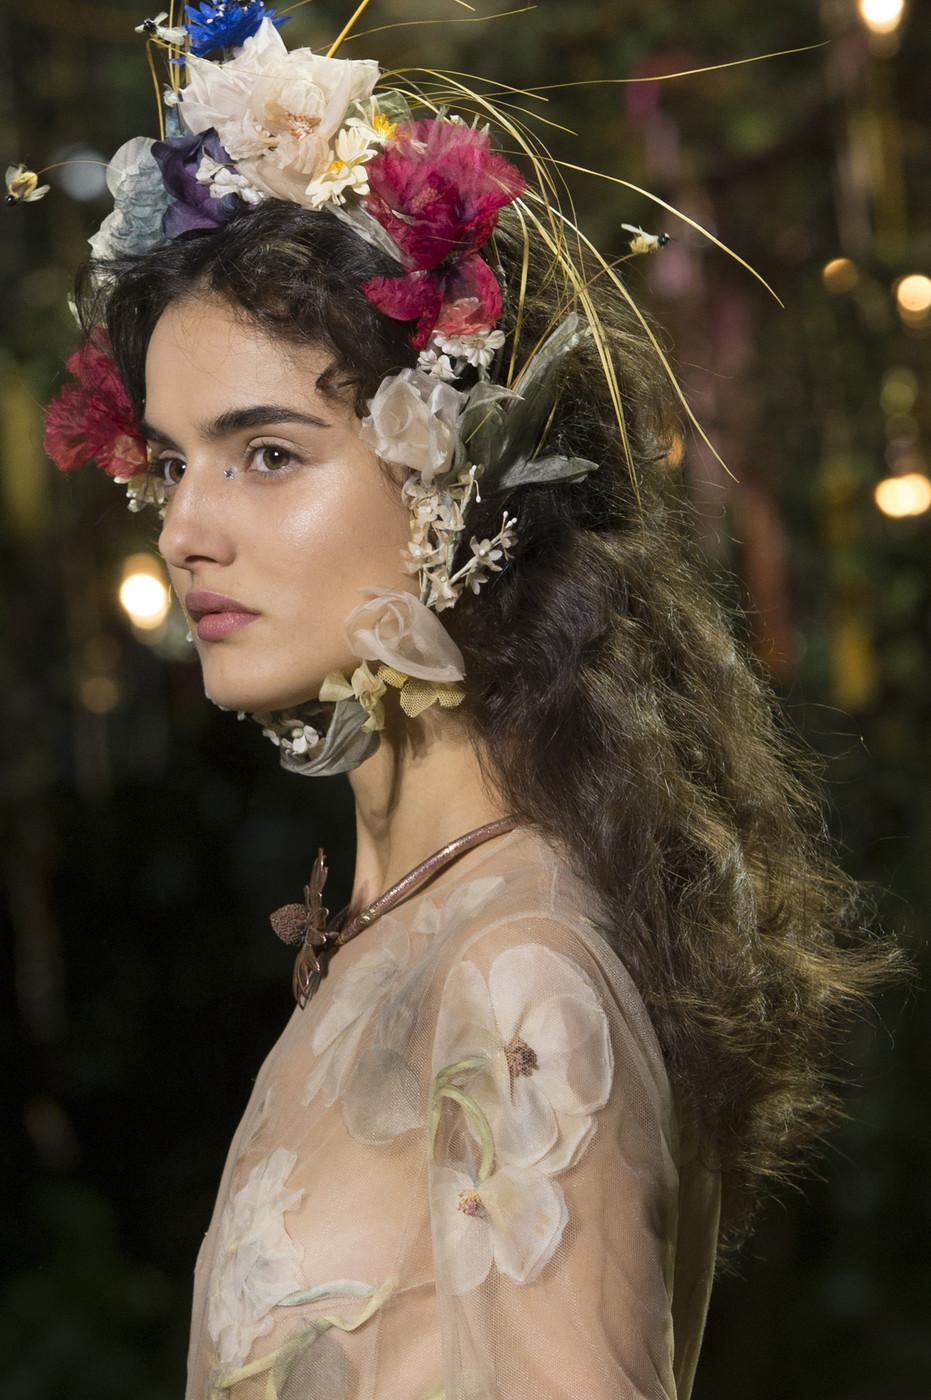 Christian+Dior+Spring+2017+Details+FU6tQGmciJcx.jpg